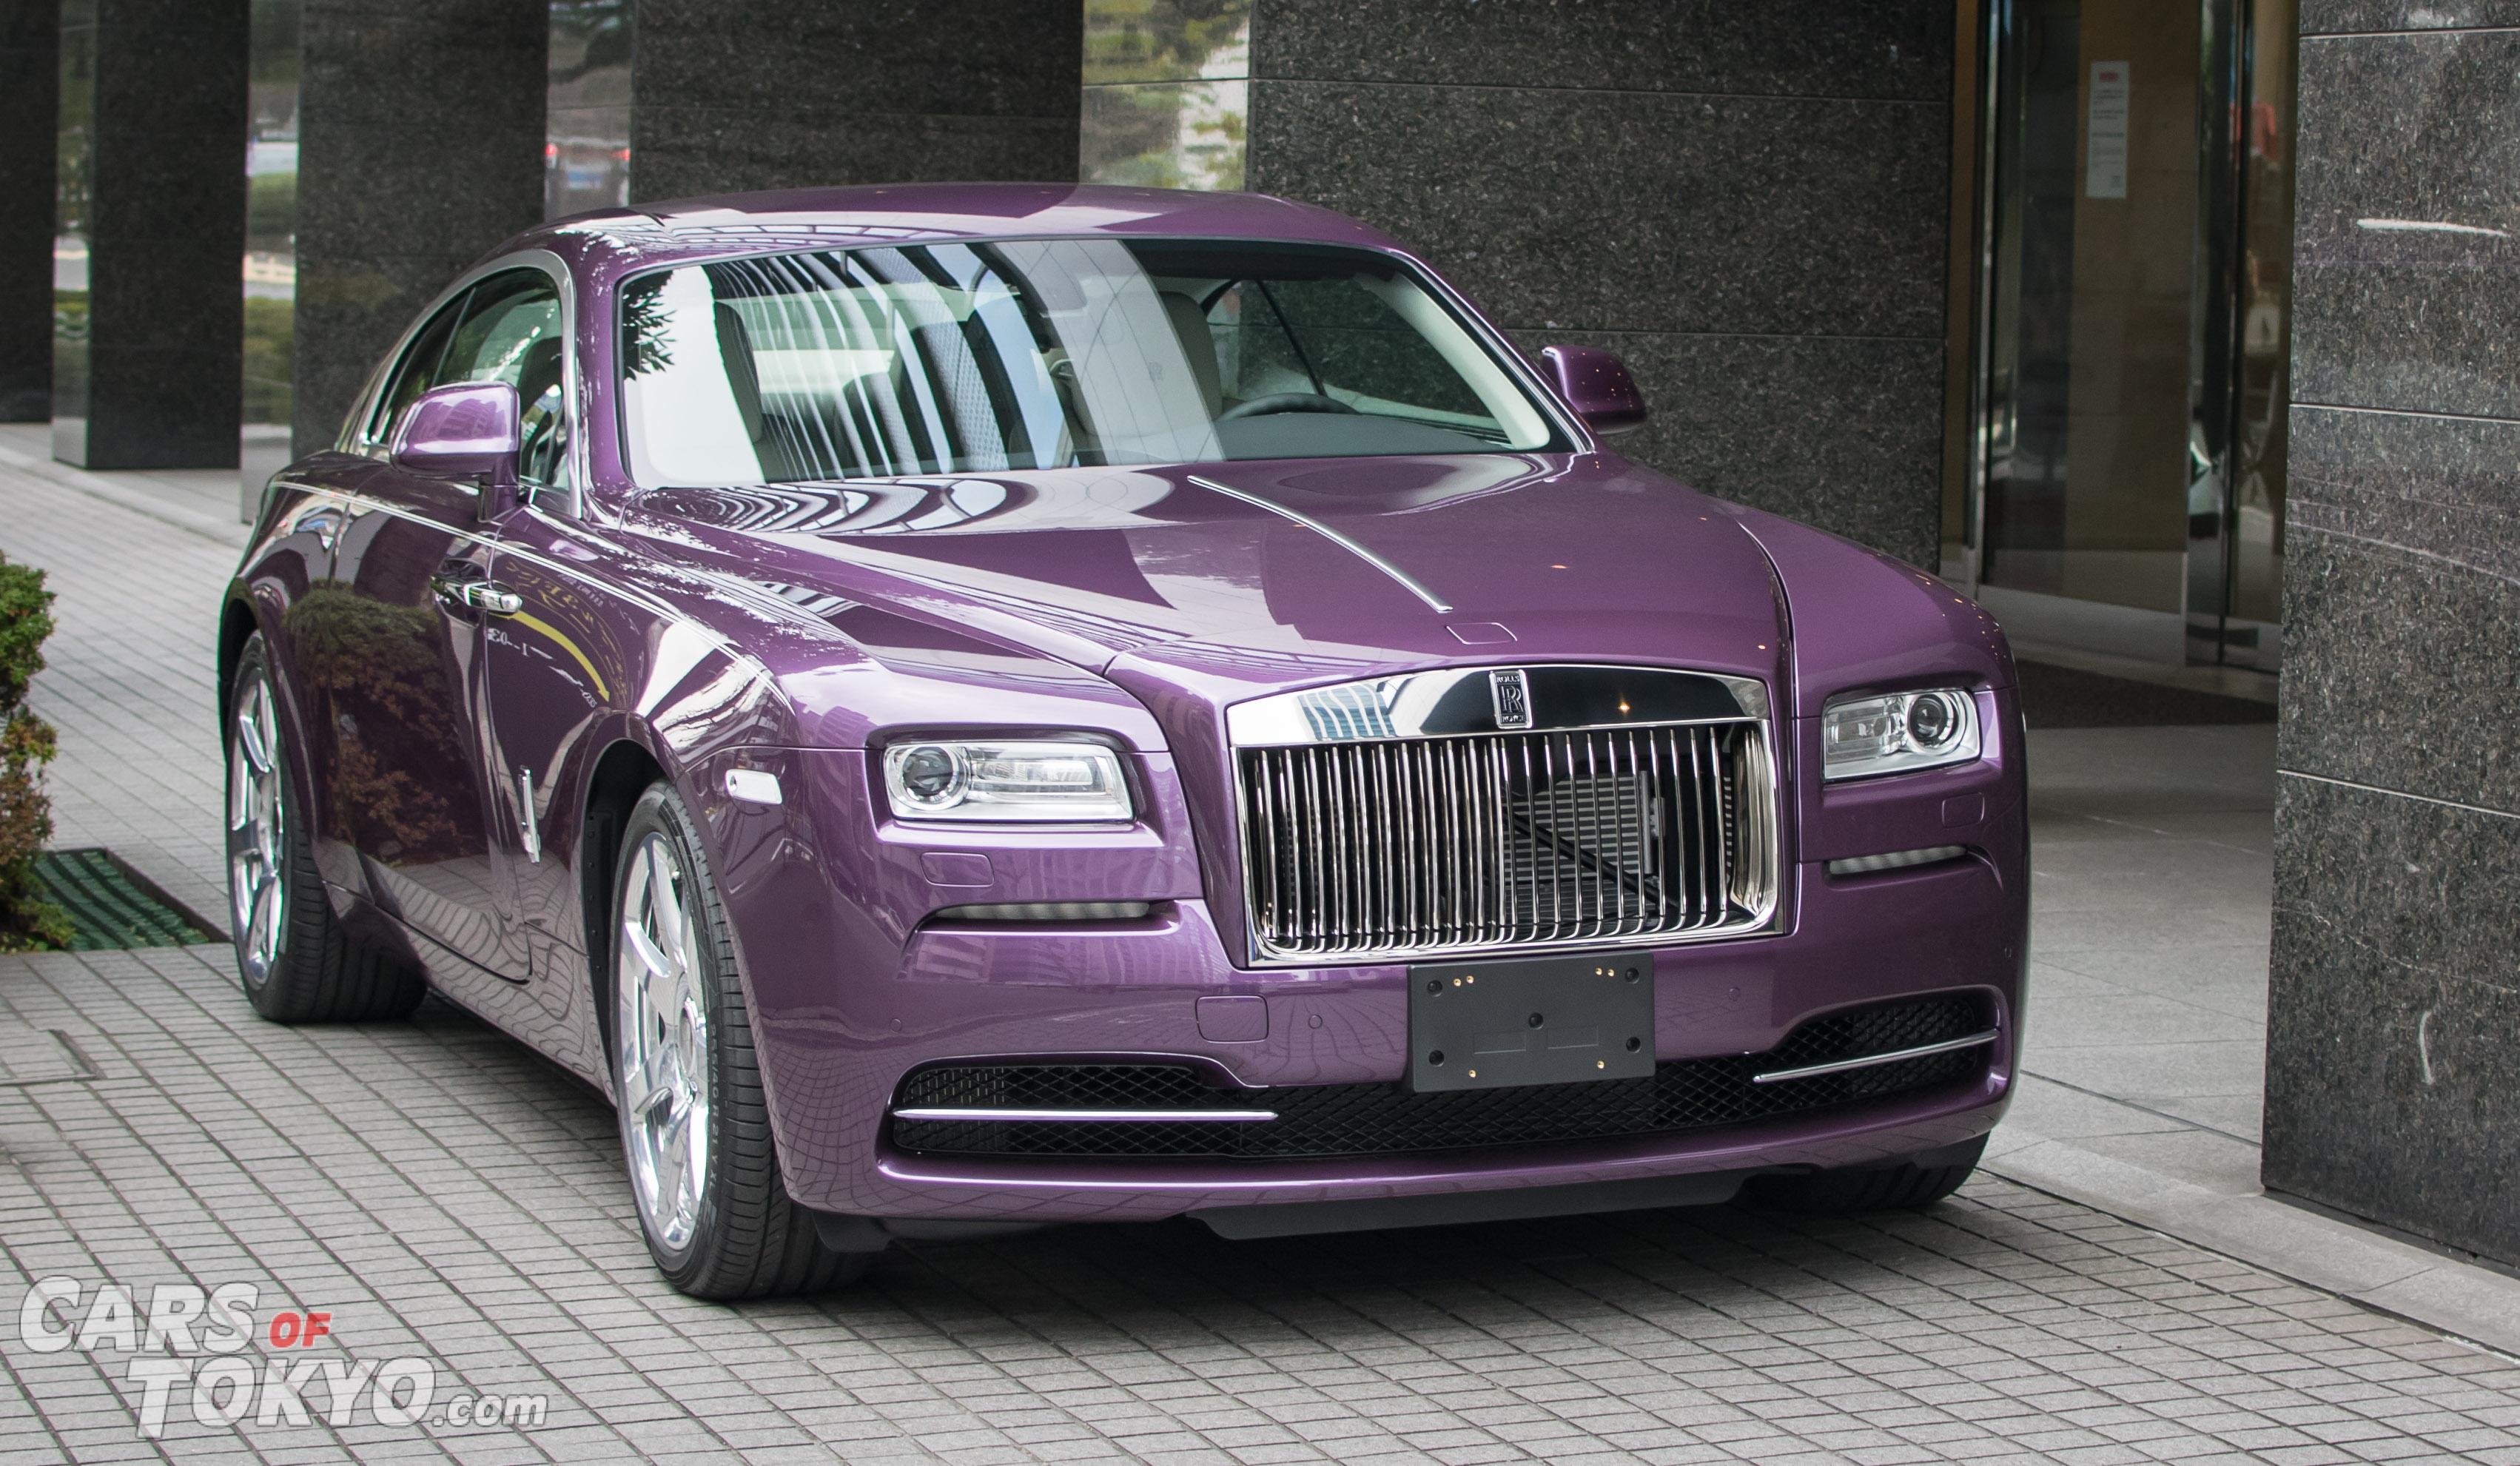 Cars of Tokyo Unusual Spec Rolls Royce Wraith